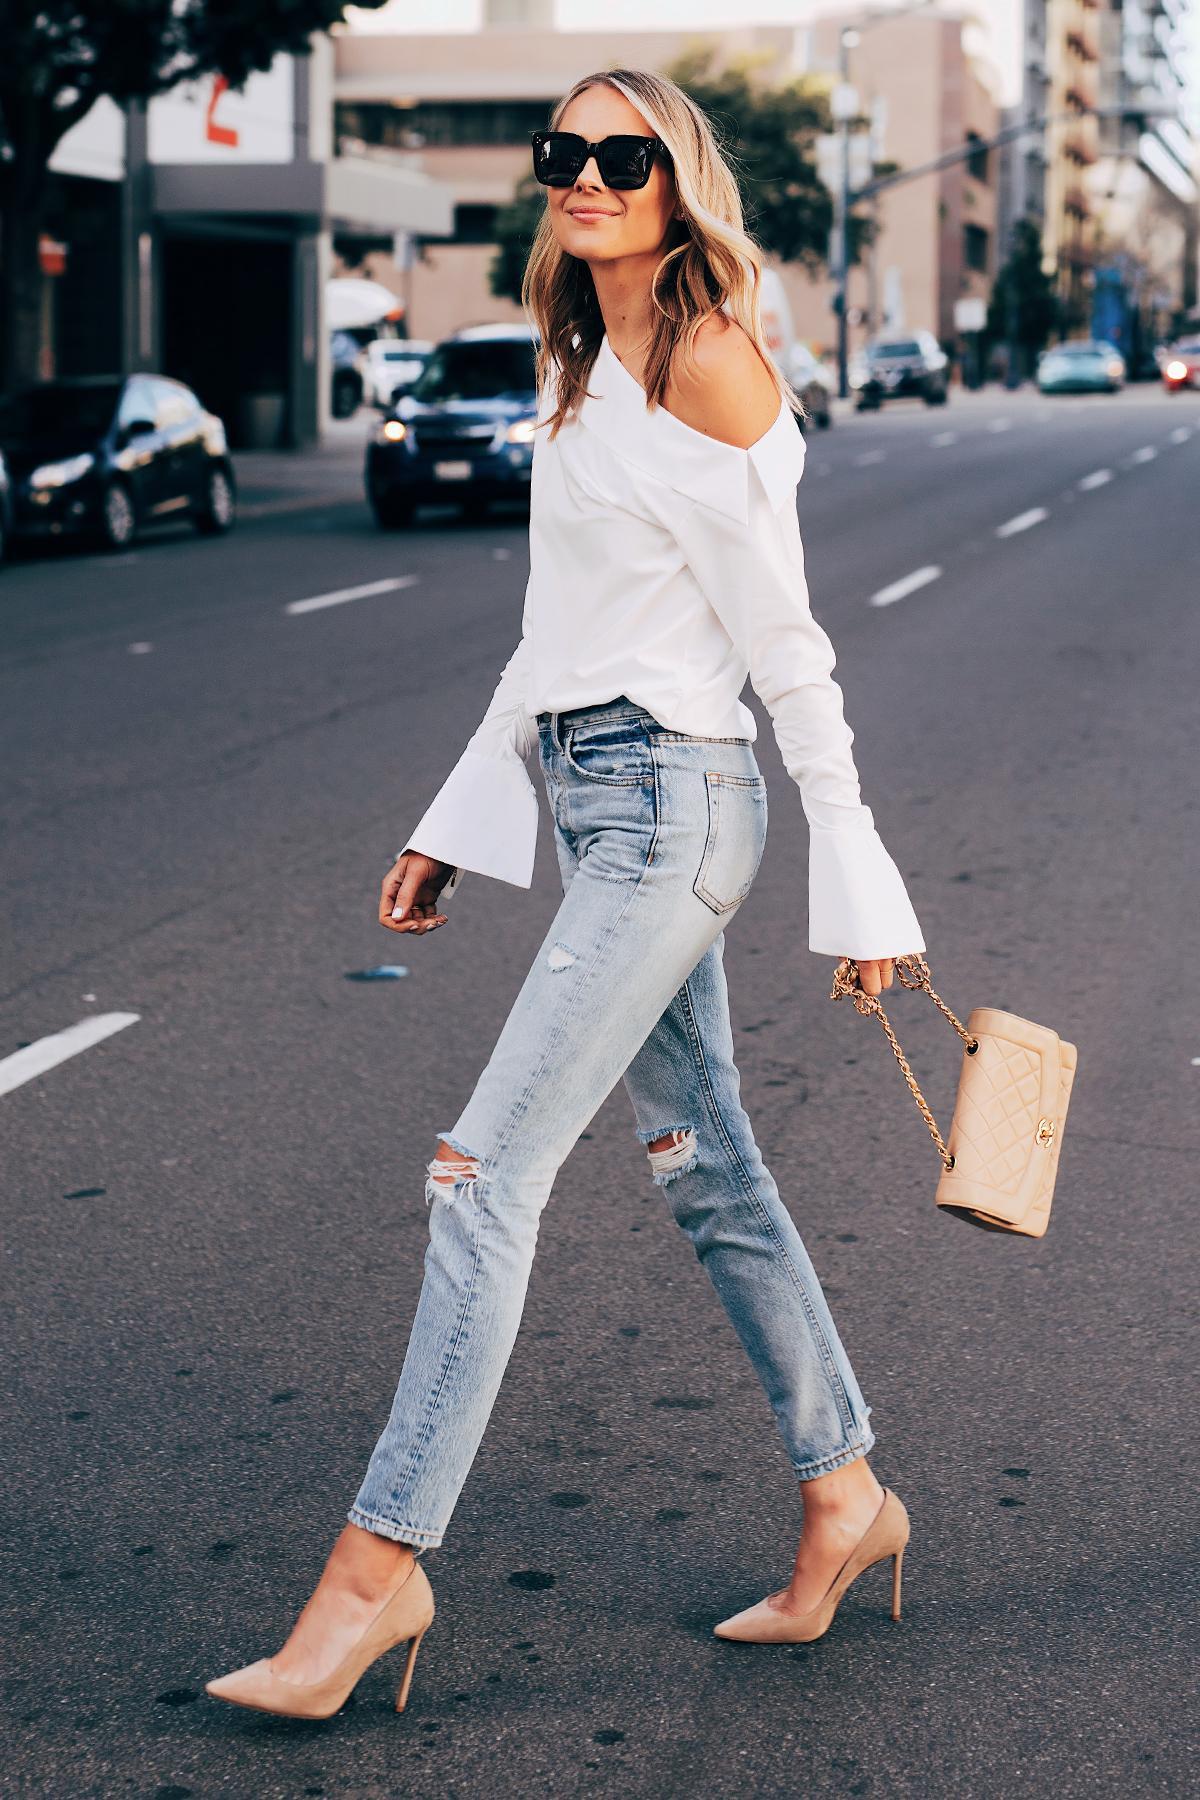 fashionjackson blogger top blouse white blouse ripped jeans skinny jeans pumps bag black sunglasses